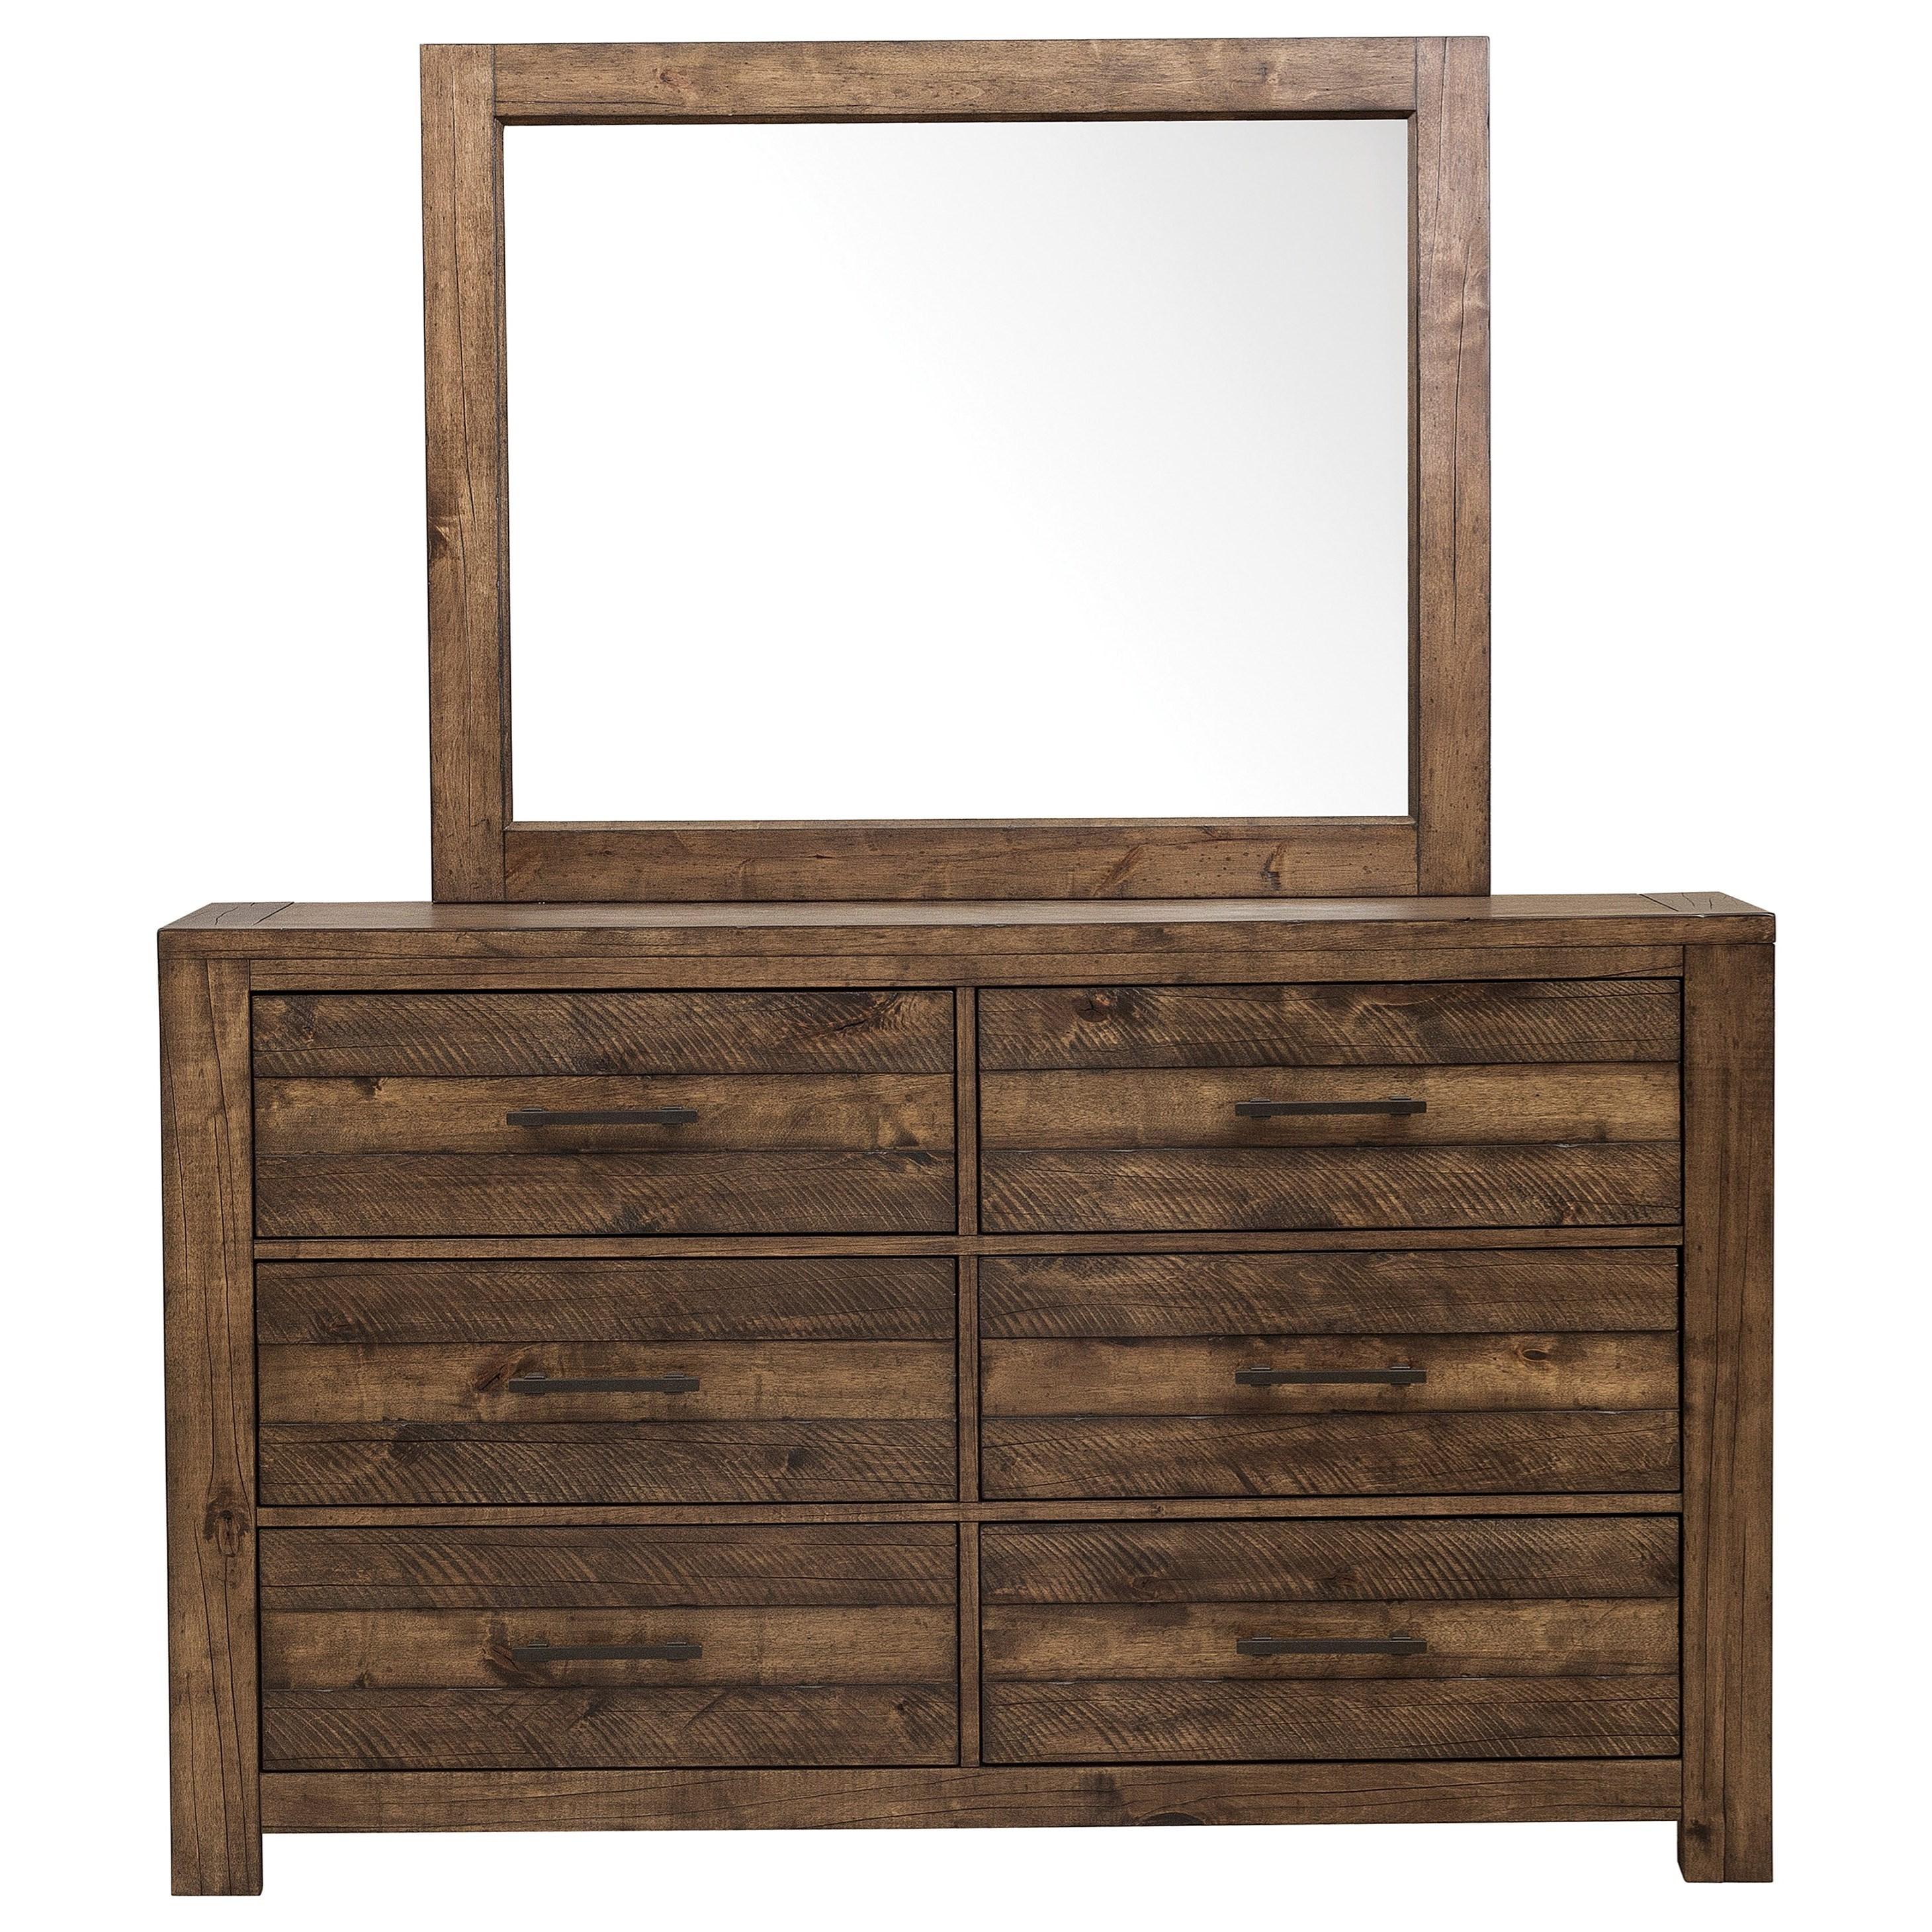 Dakota Dresser and Mirror Combo by Samuel Lawrence at Carolina Direct